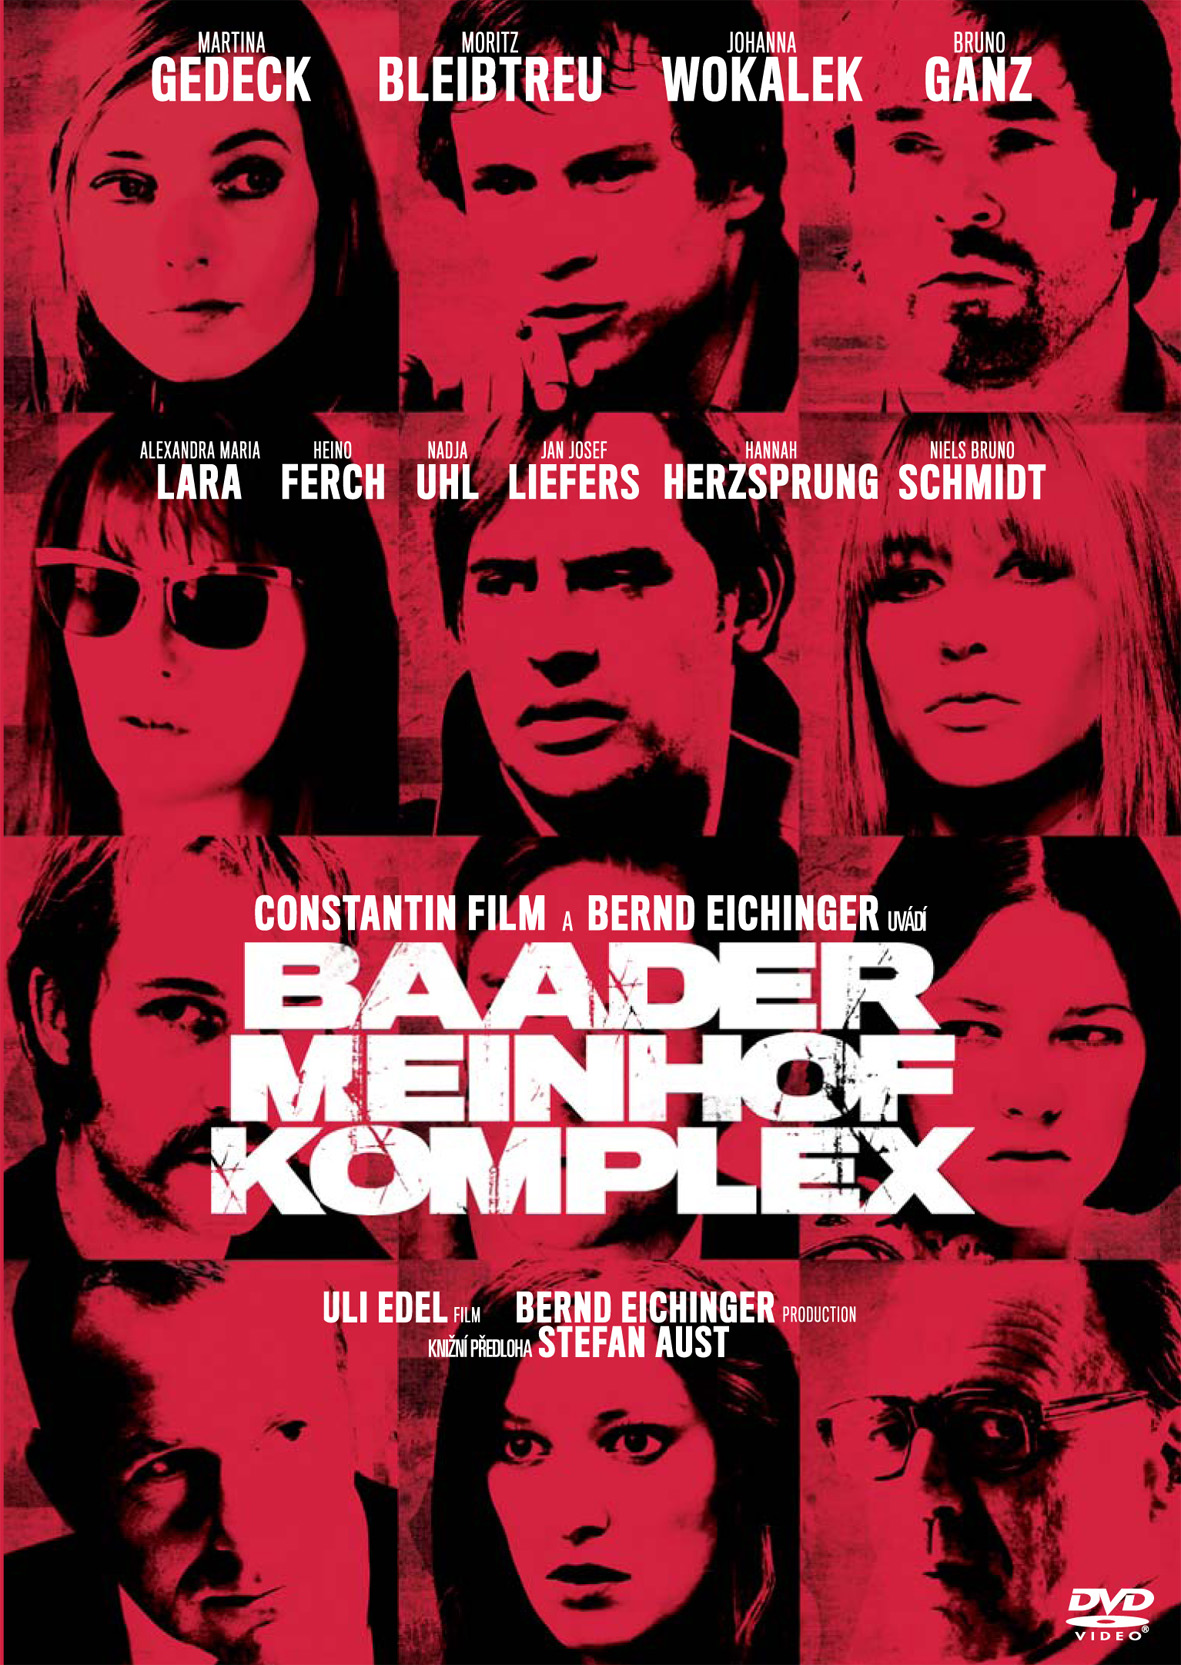 Film Baader Meinhof Komplex ke stažení - Film Baader Meinhof Komplex download